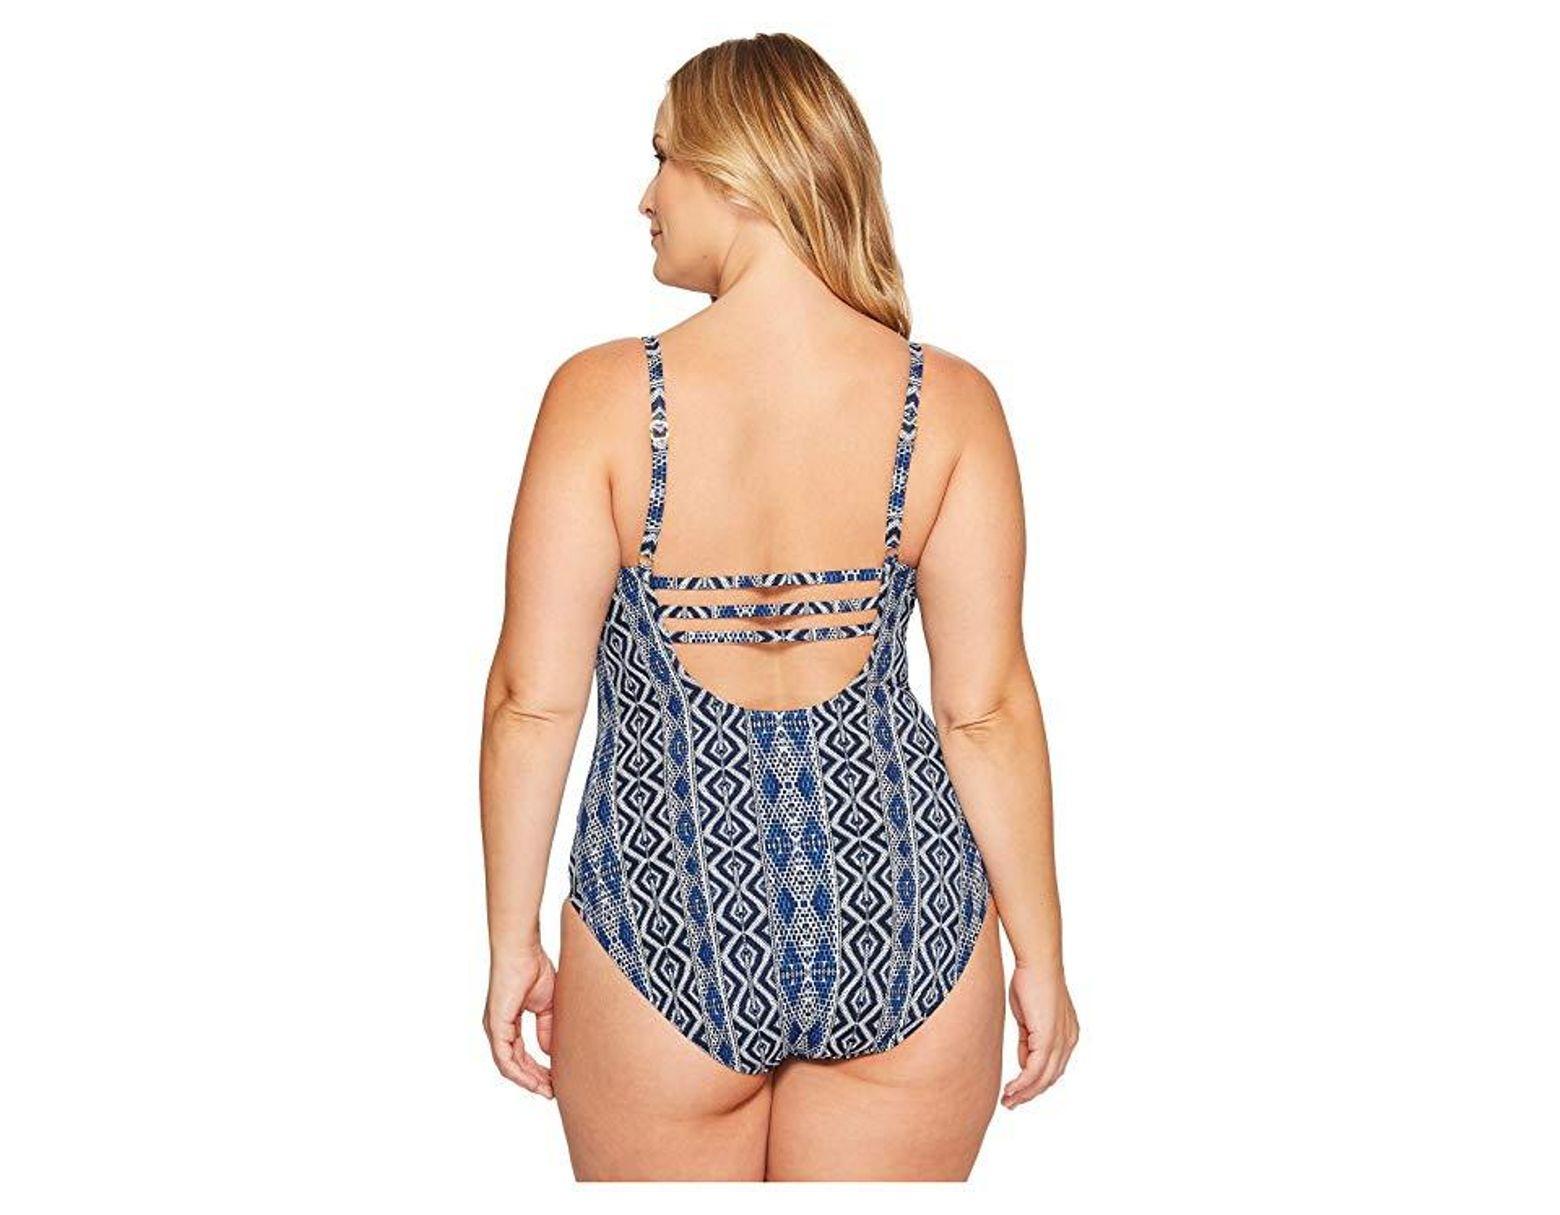 7666d86783e La Blanca Plus Size Designer Jeans Keyhole Ots One-piece (indigo) Swimsuits  One Piece in Blue - Save 57% - Lyst